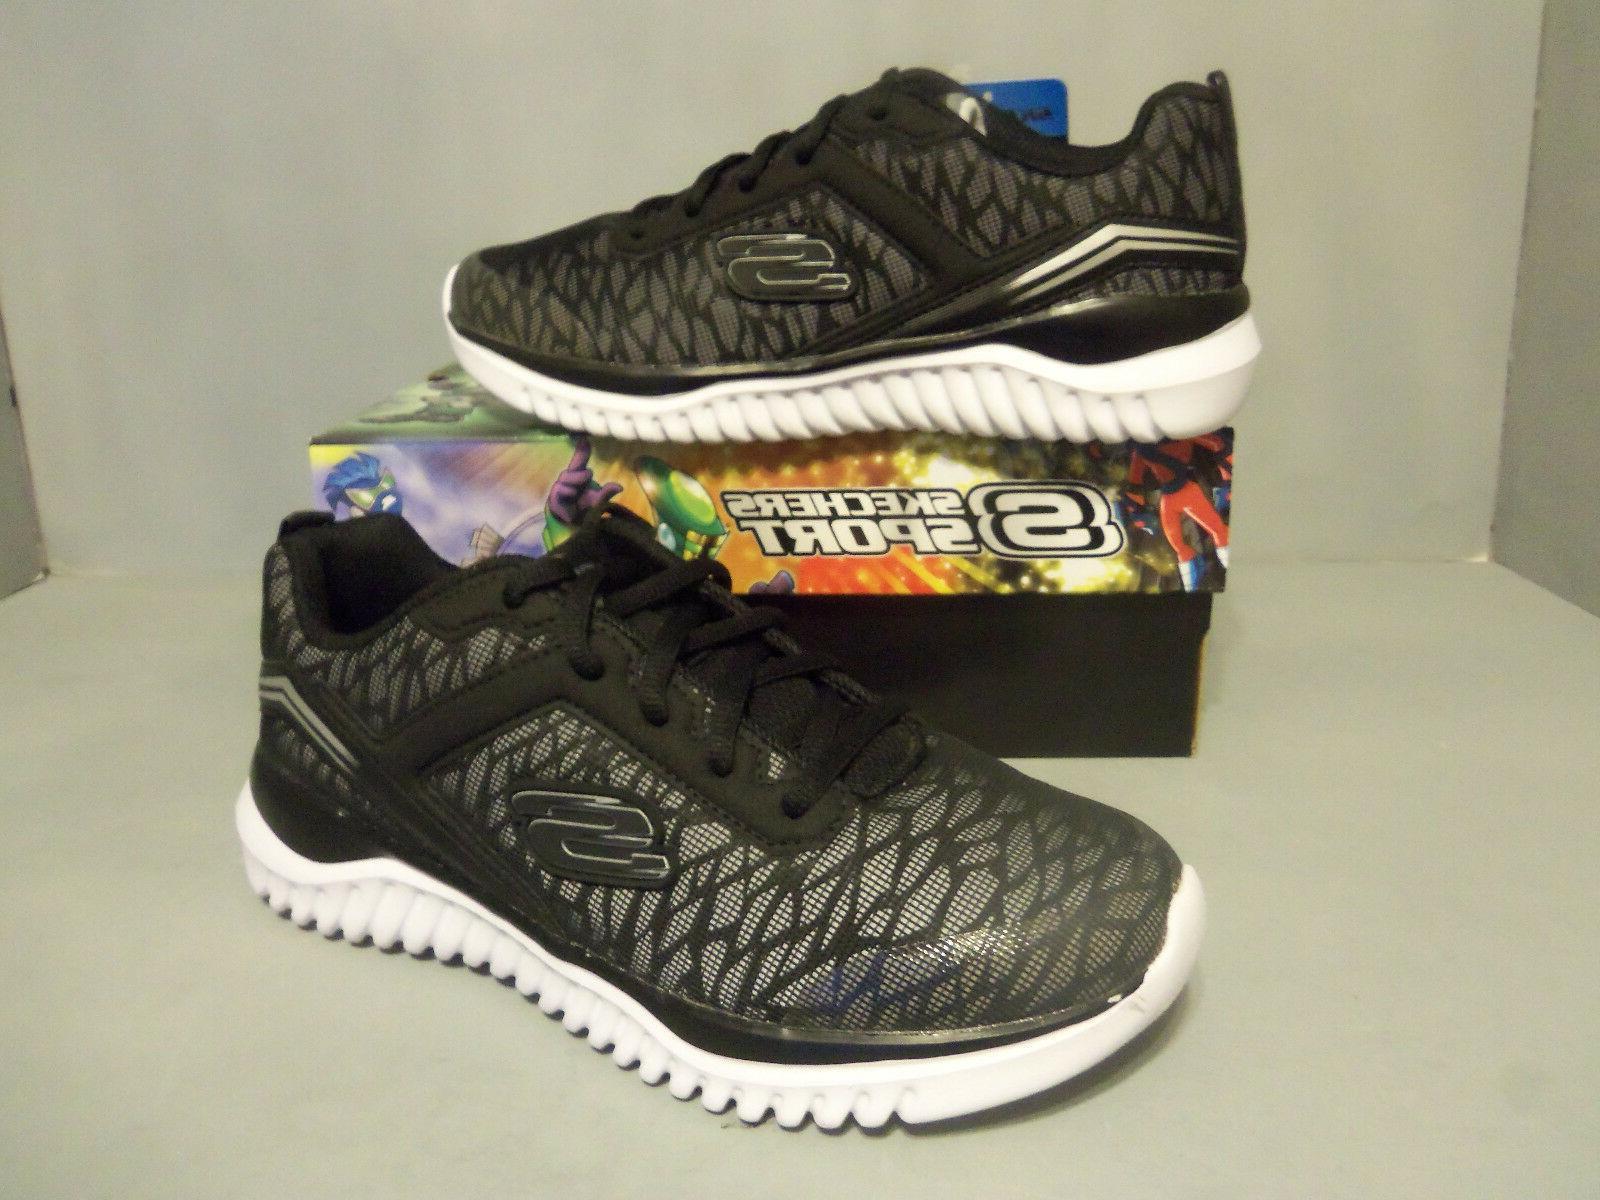 SKECHERS Boy's Youth Turboshift Sneakers Shoes Reflective, B